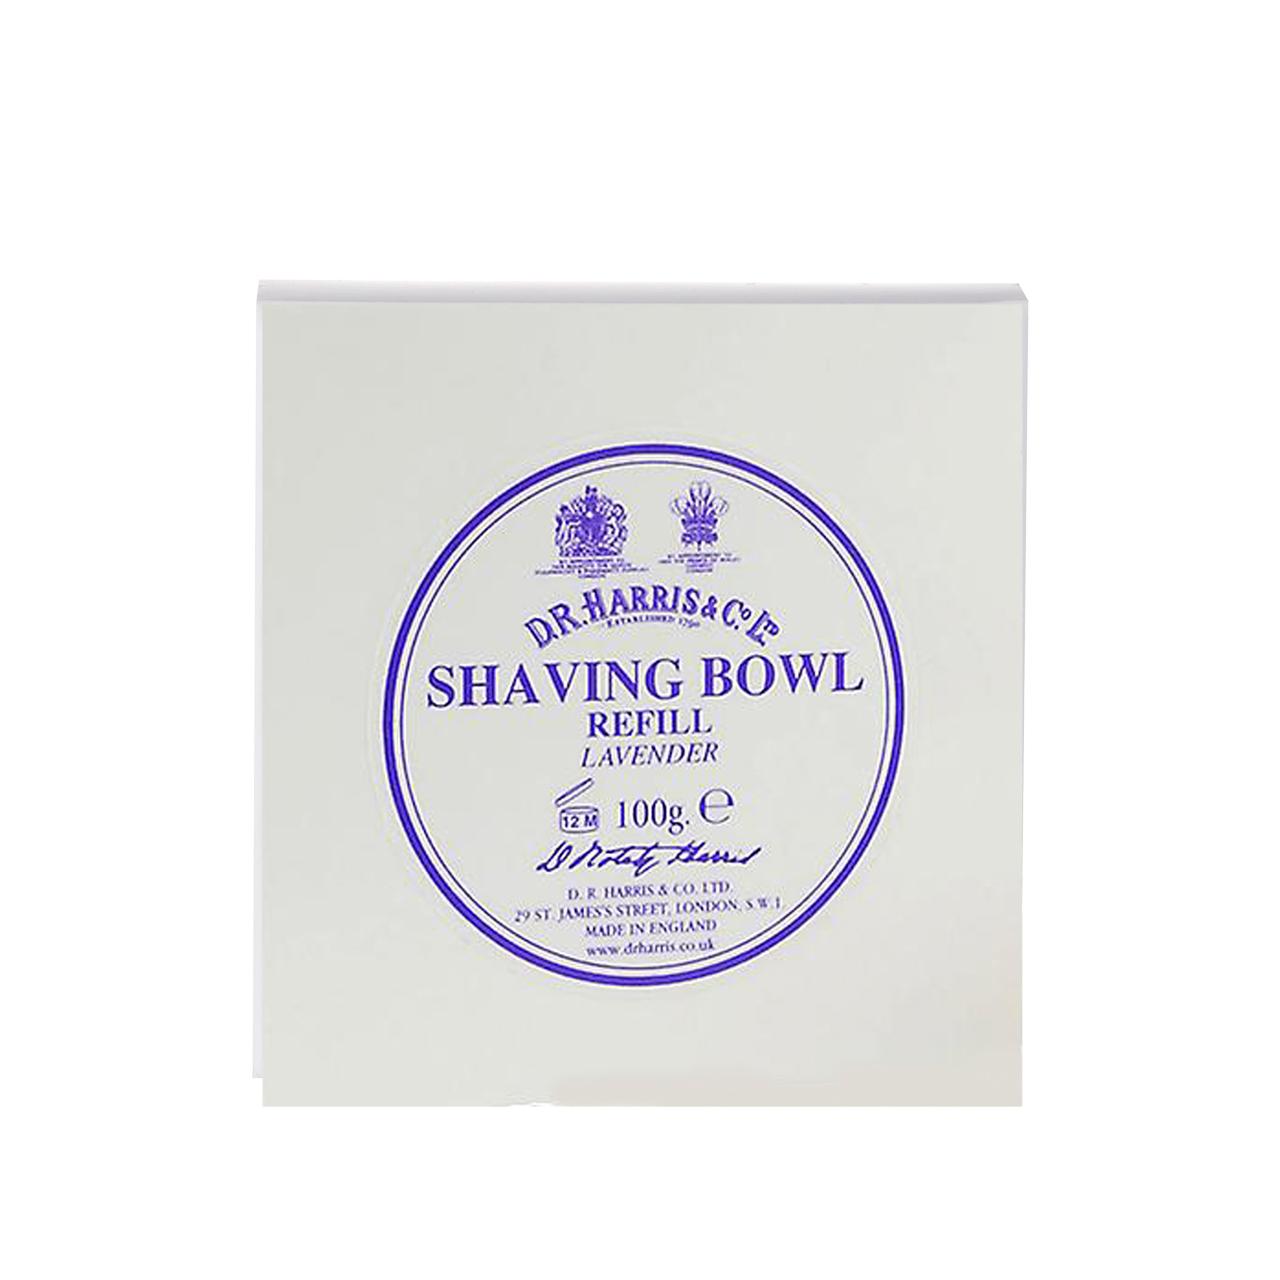 Lavender - Shaving Soap Refill